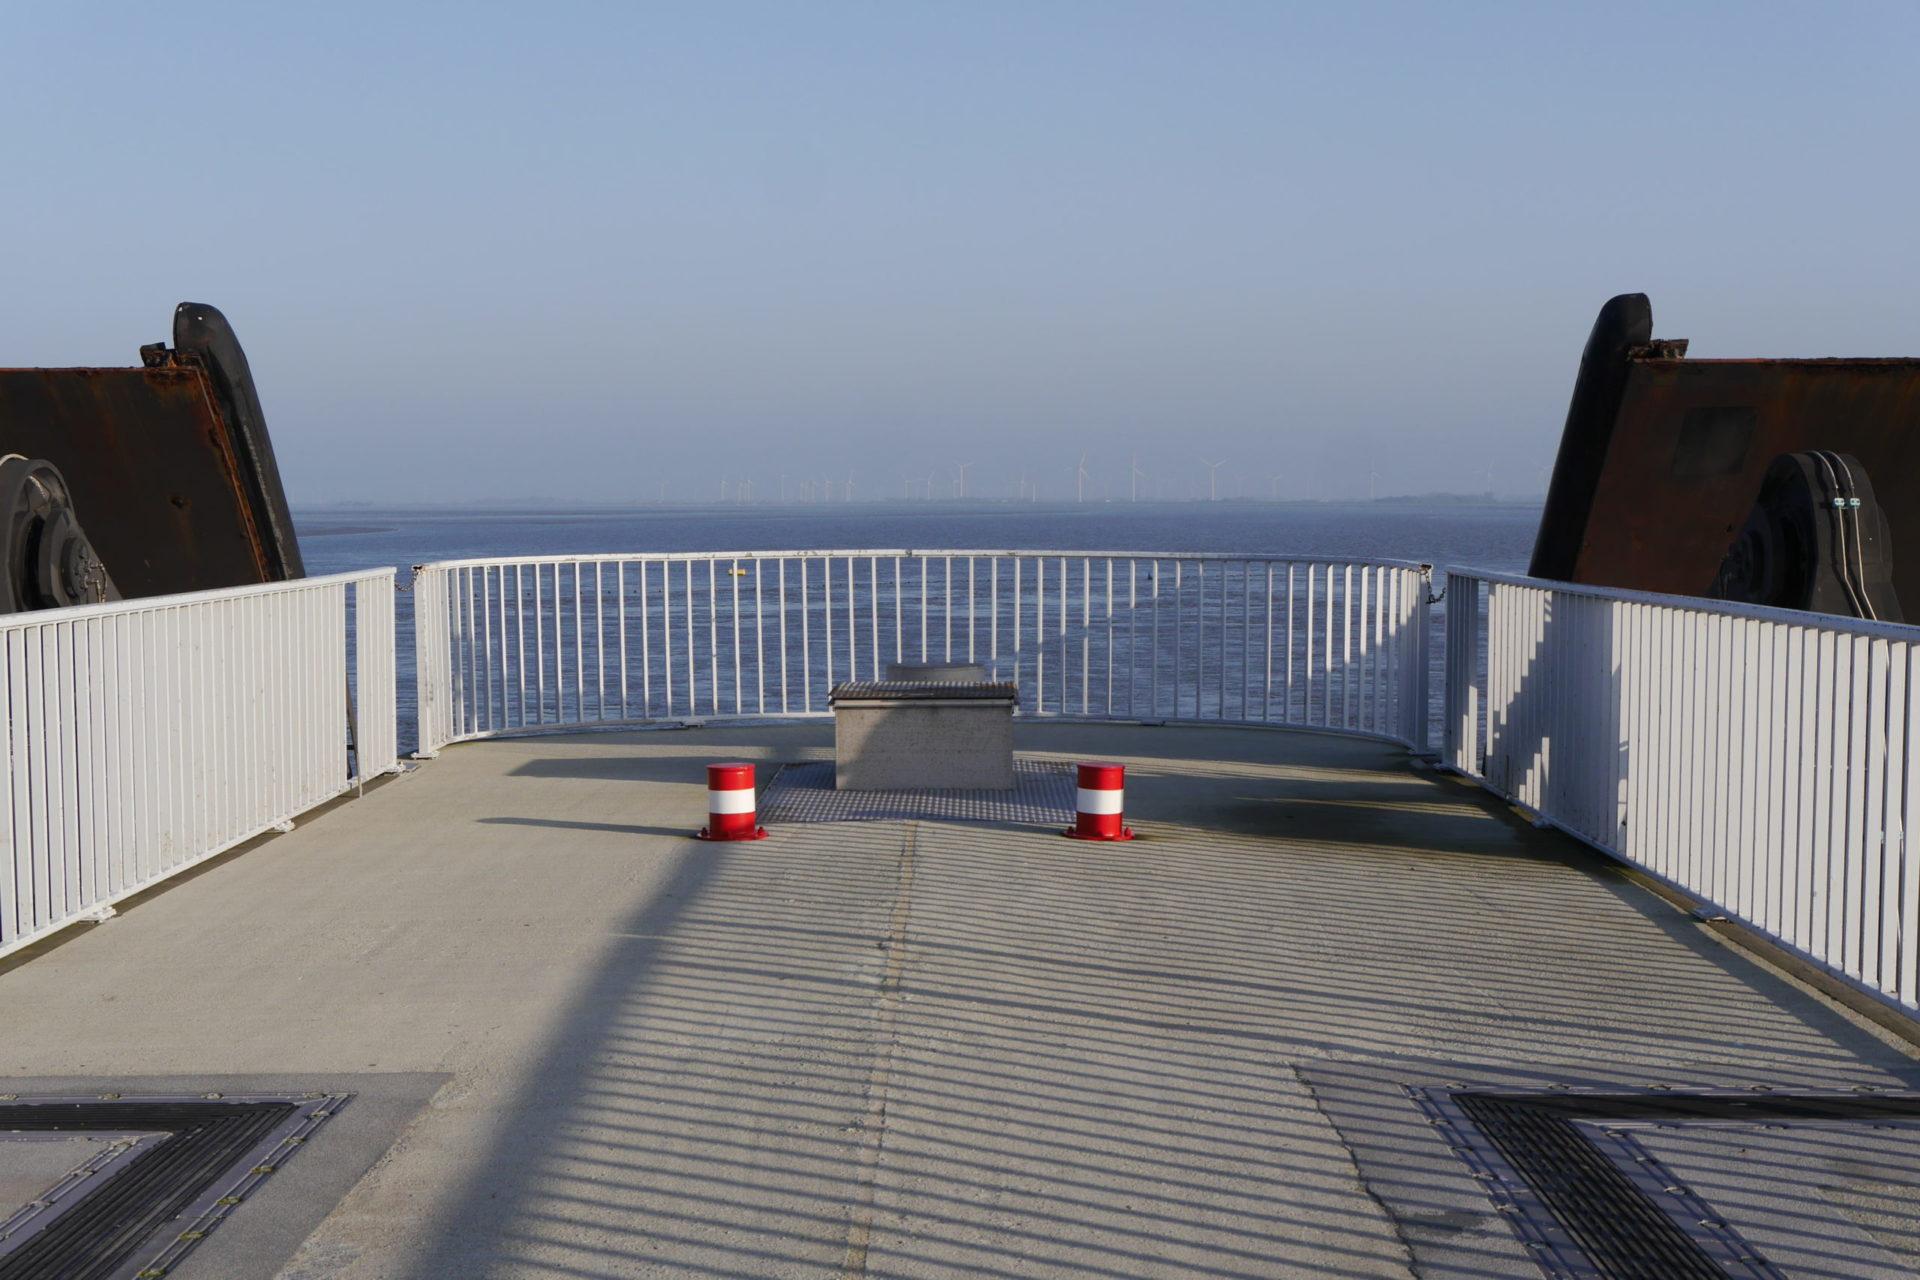 Le grand barrage de la mer du Nord